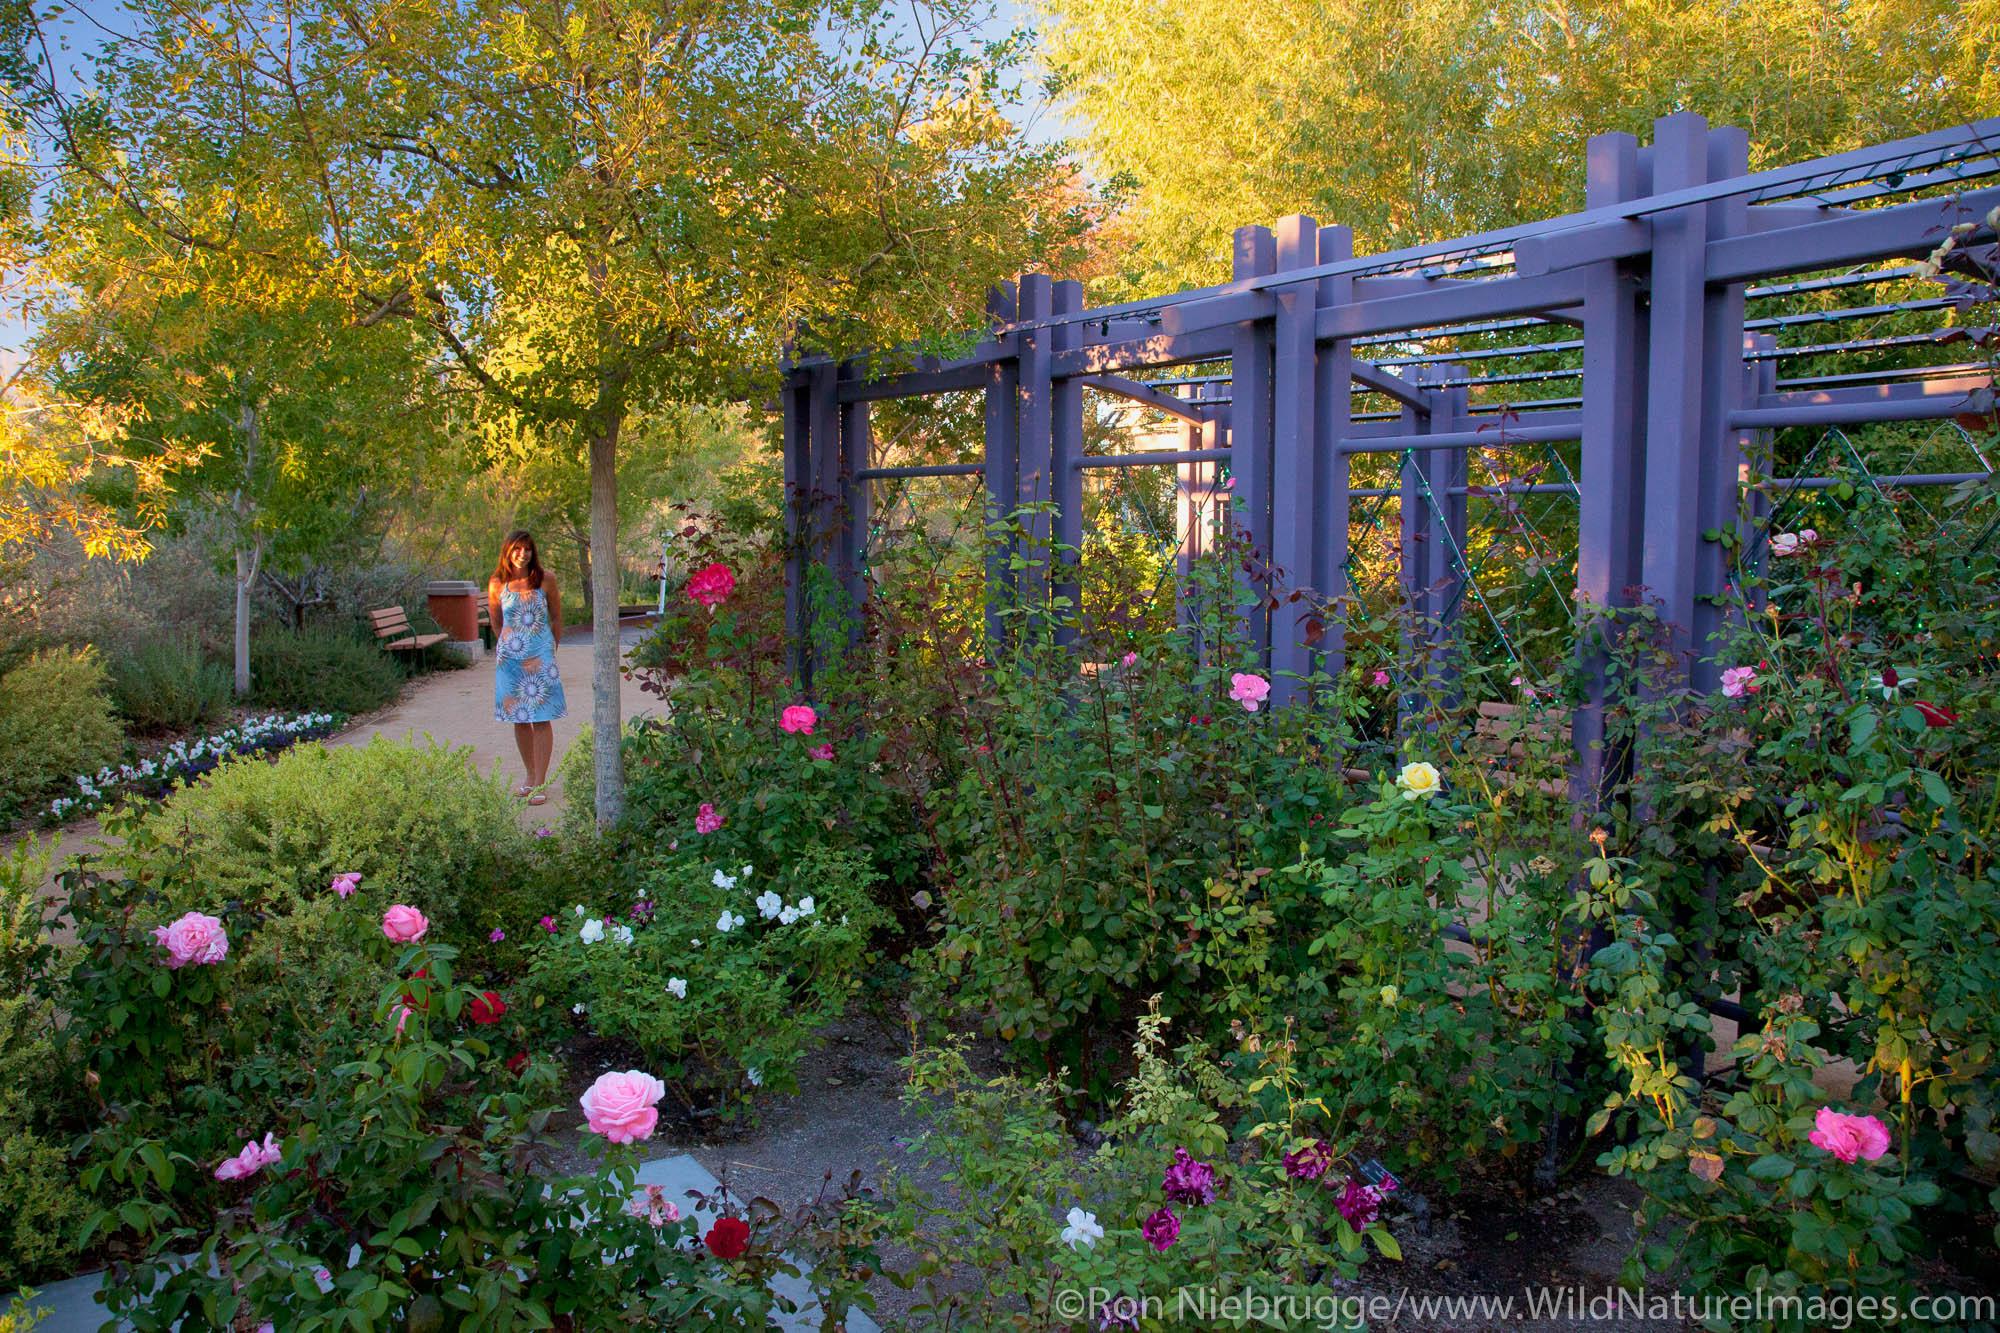 The Gardens at Springs Preserve, Las Vegas, Nevada (model released)